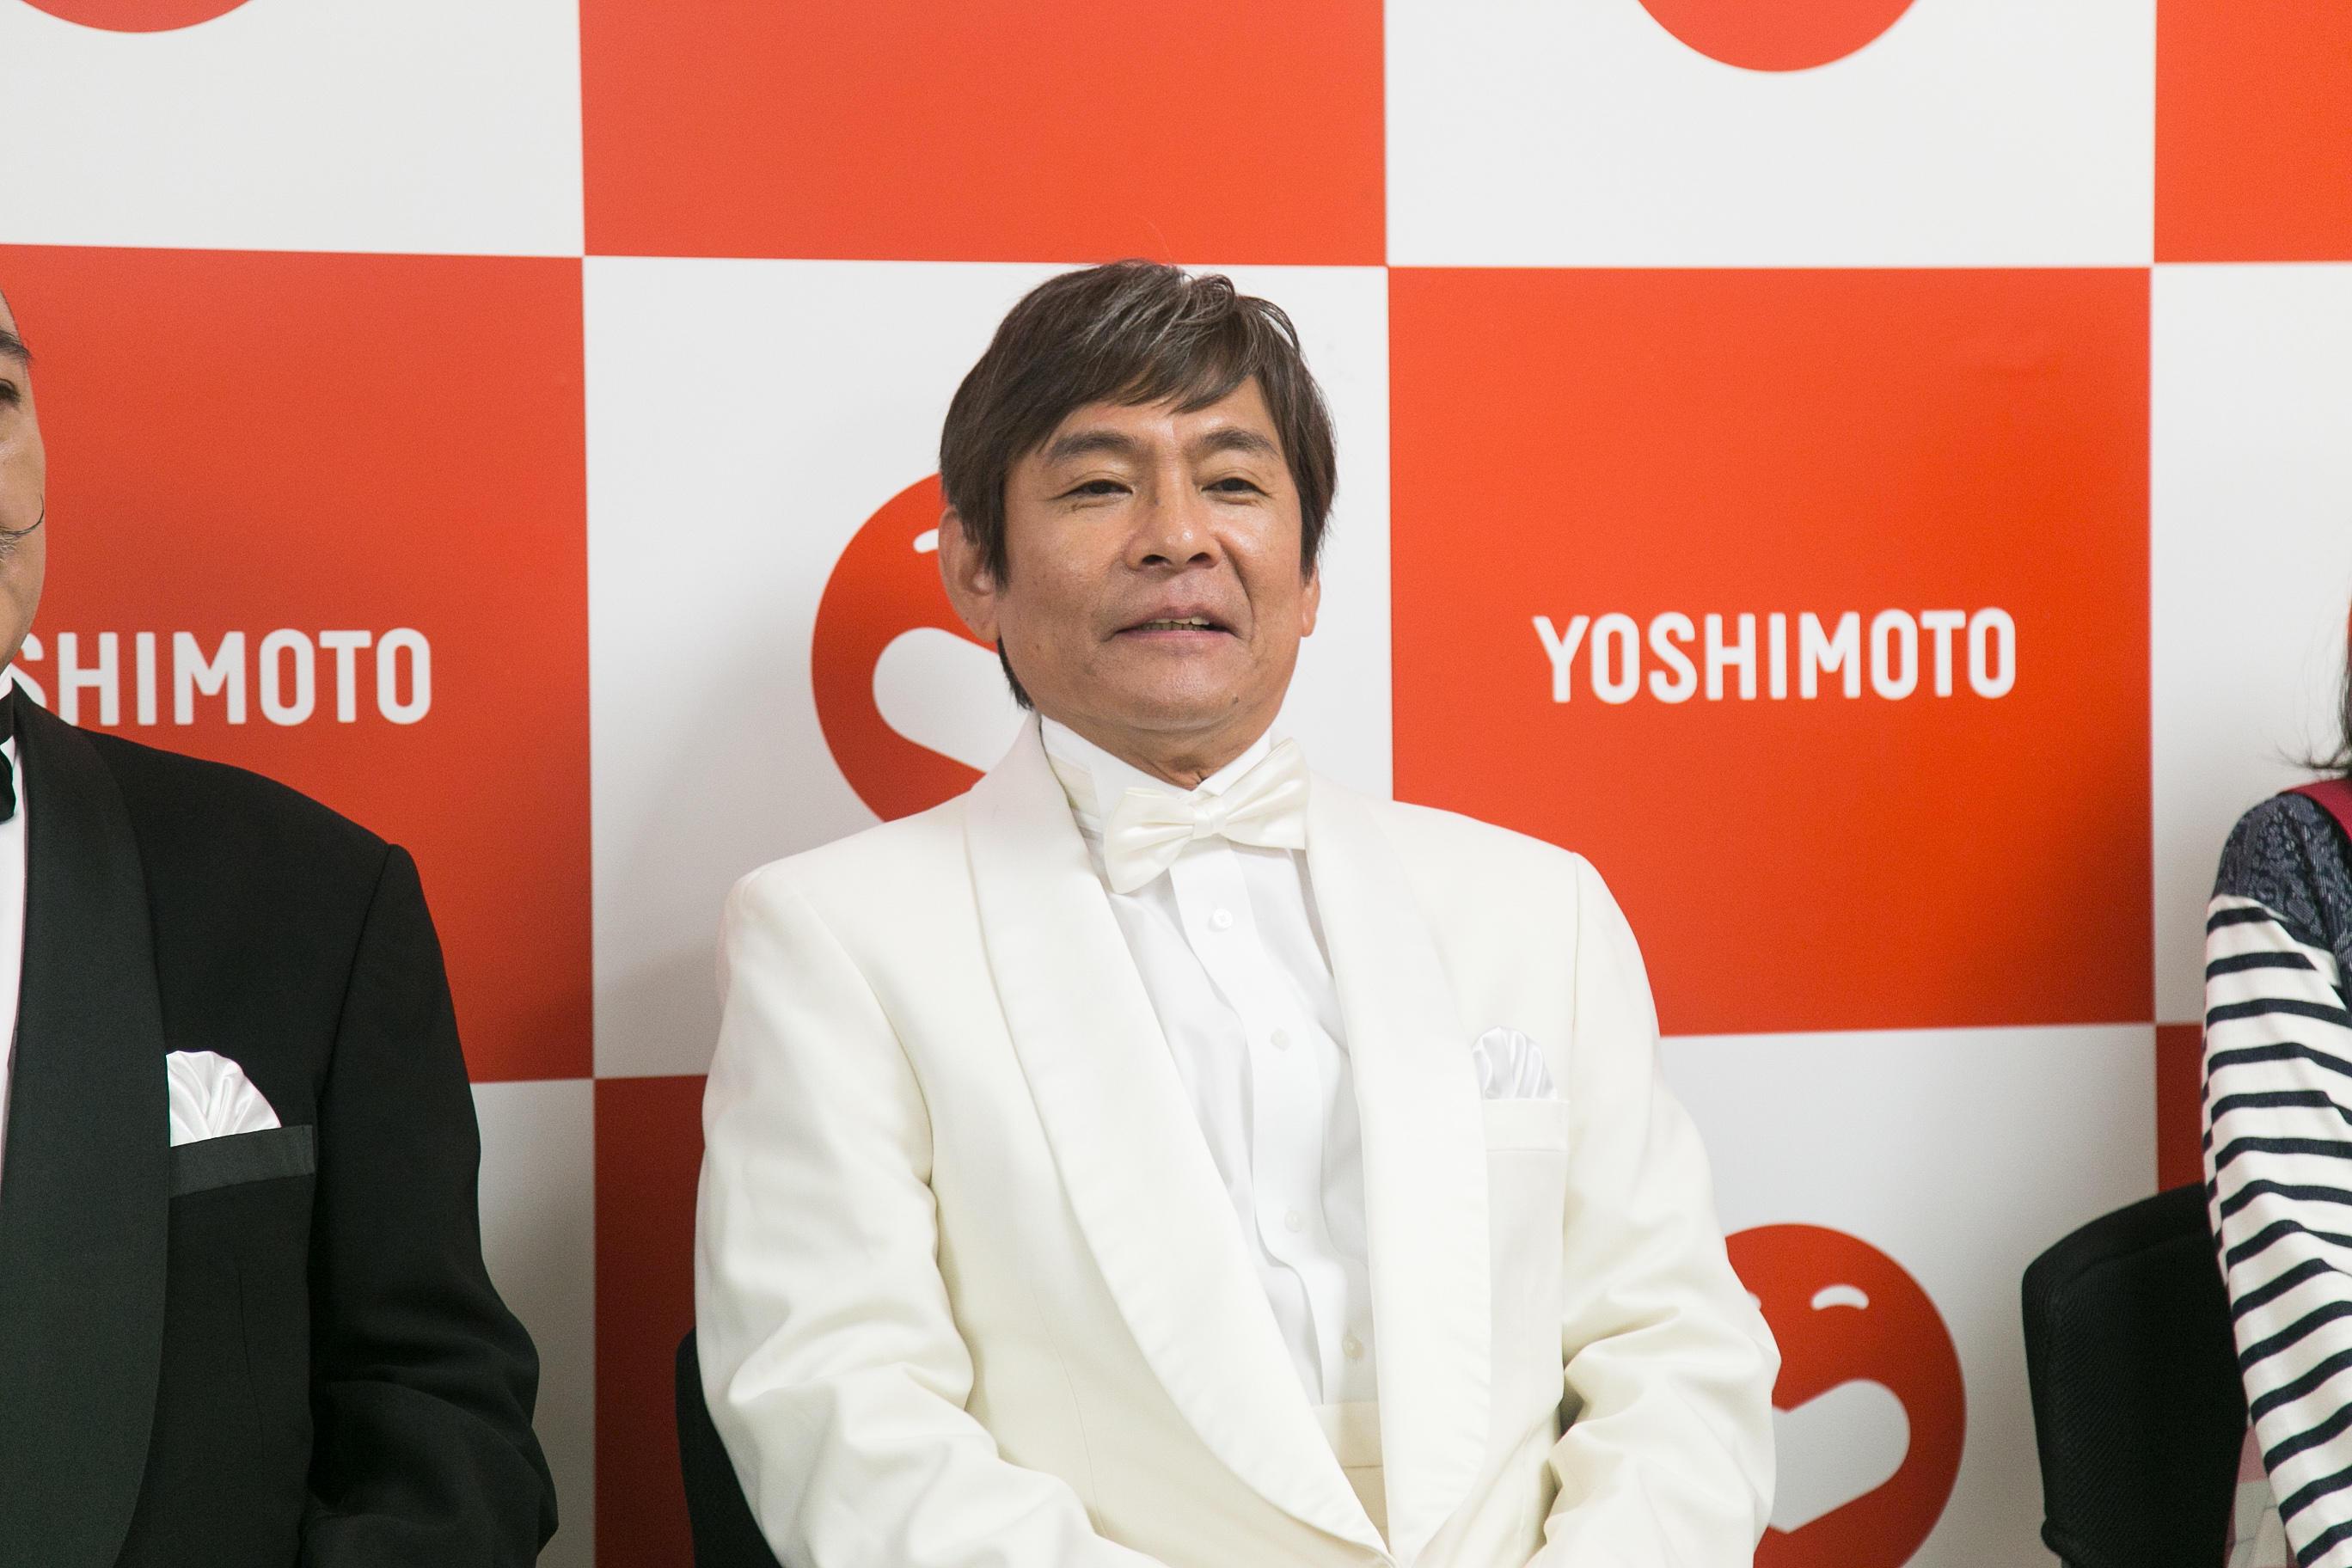 http://news.yoshimoto.co.jp/20180914170445-443c302e7a87d2fd8f8adcaae2220ec6cb05634c.jpg